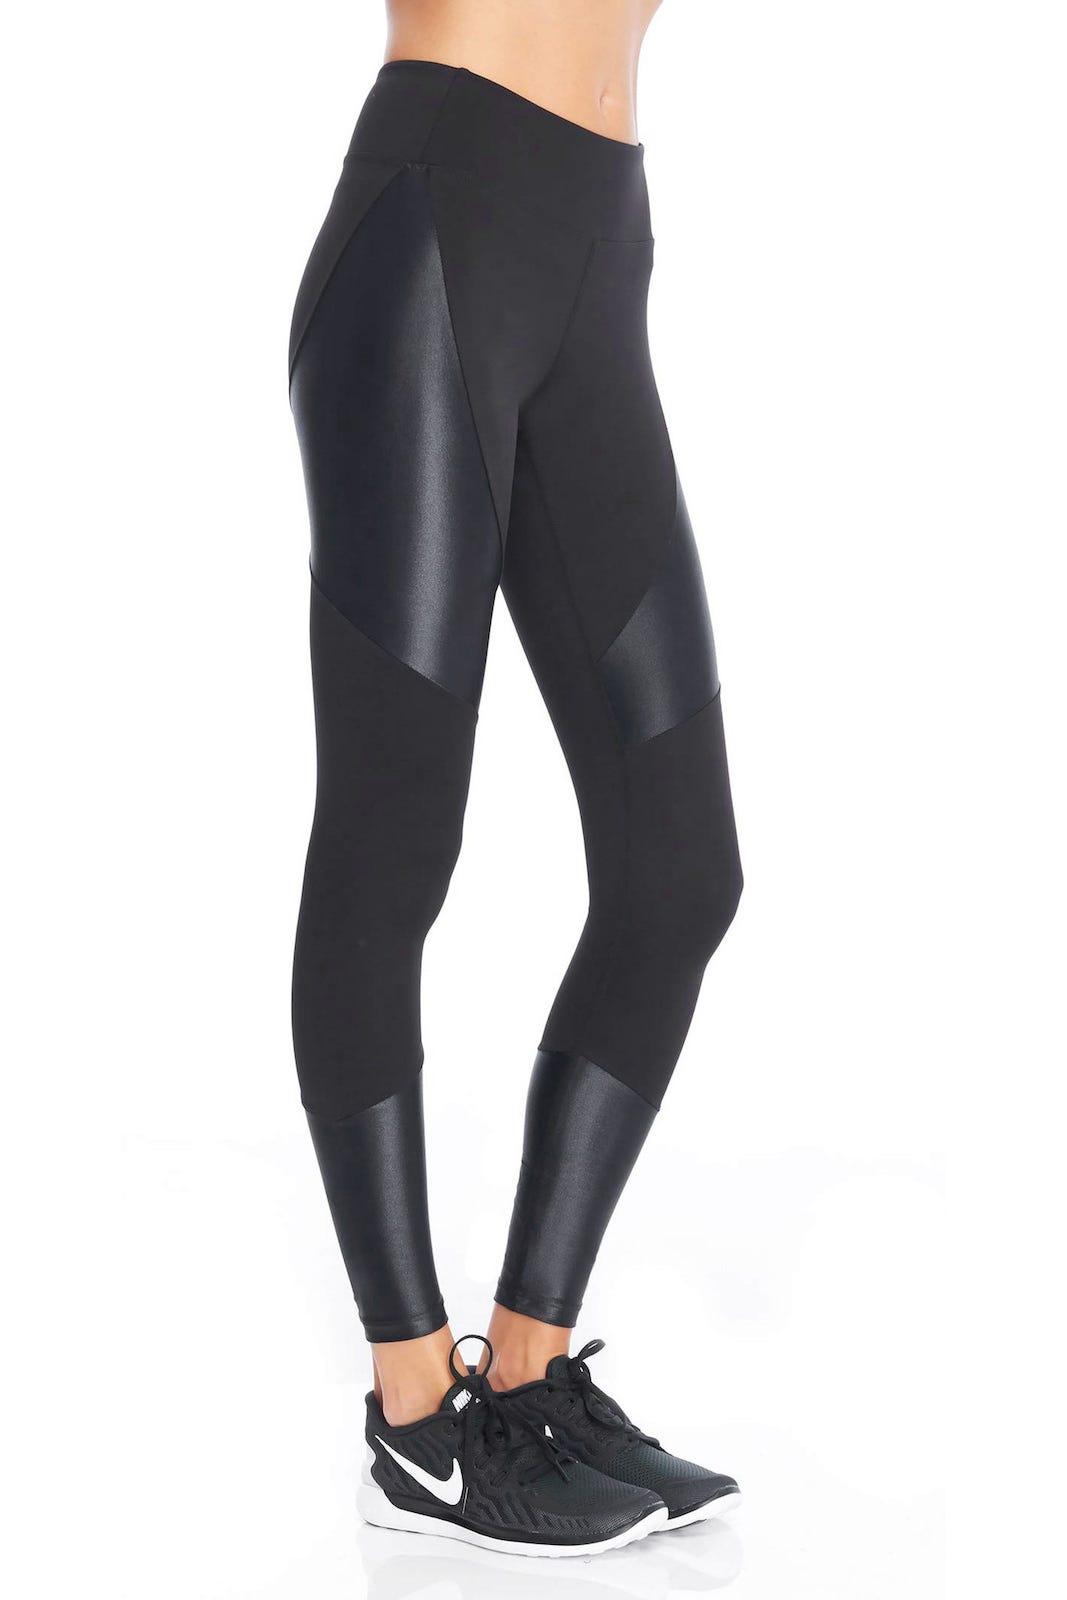 ac61285a4d384 Best Yoga Pants, Yogi Leggings - Cute Workout Clothes